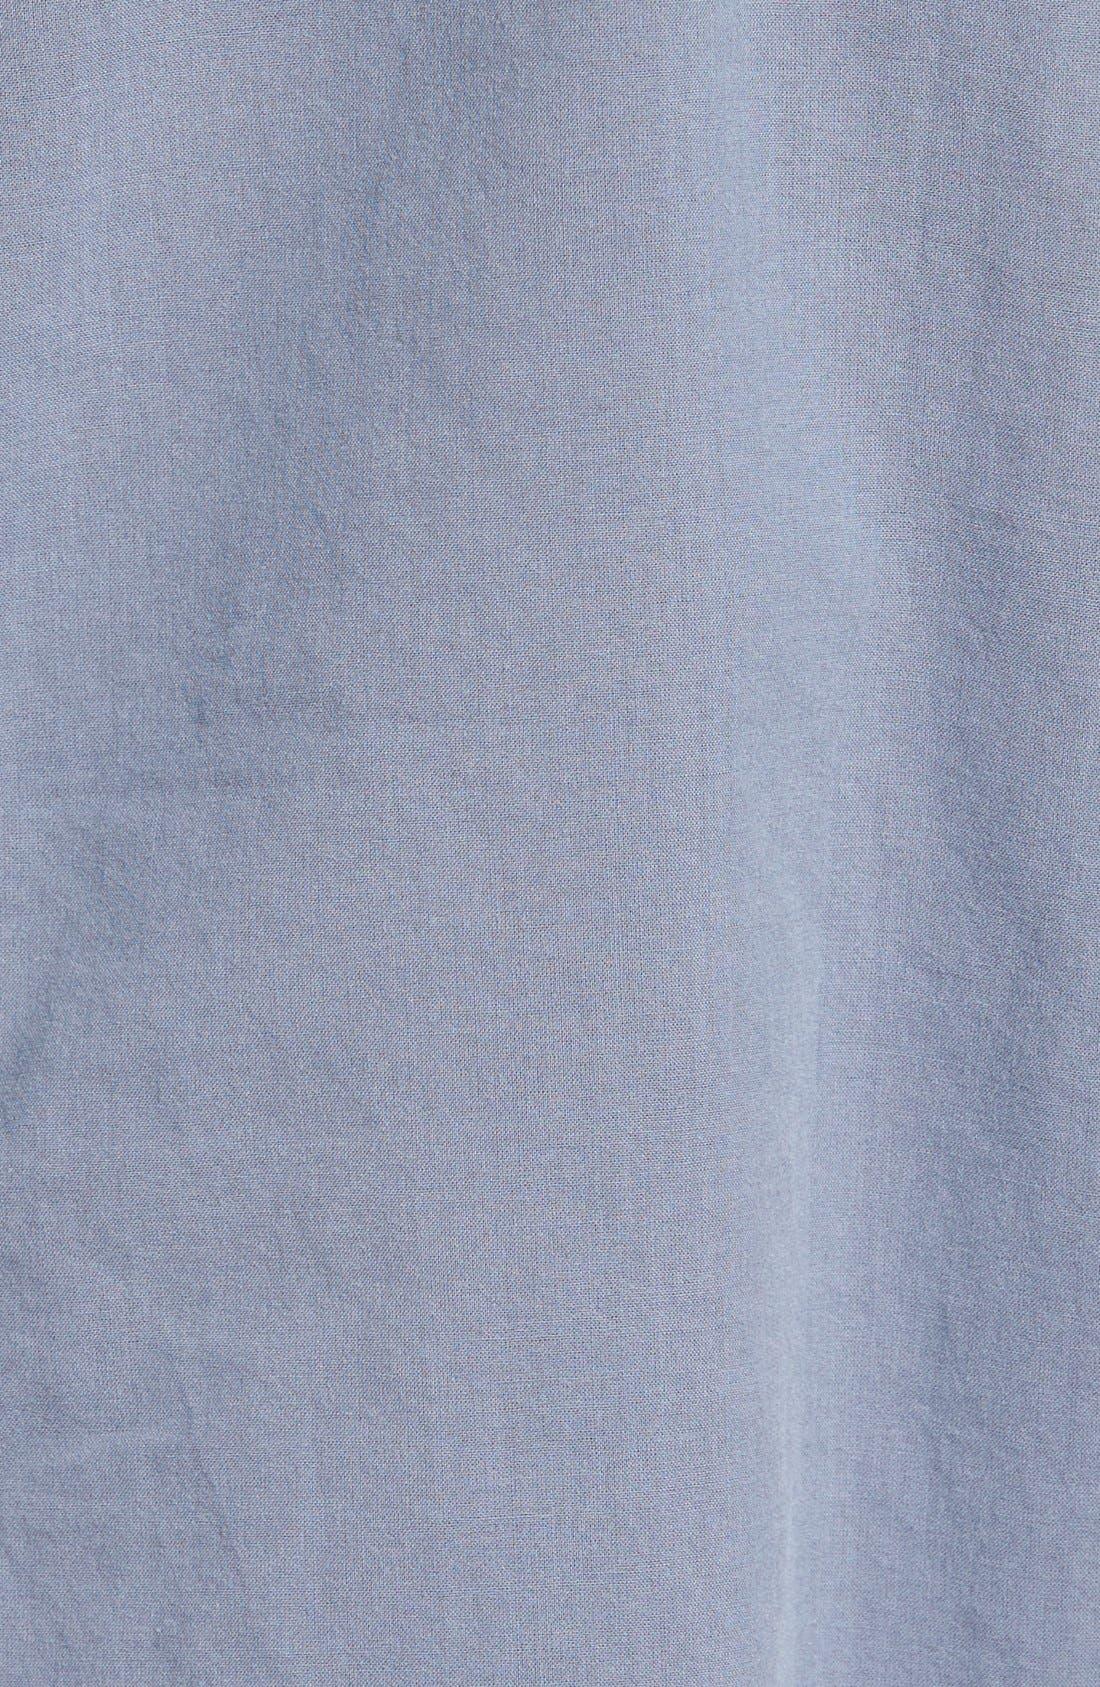 Alternate Image 5  - James Perse 'Classics' Cotton Lawn Shirt